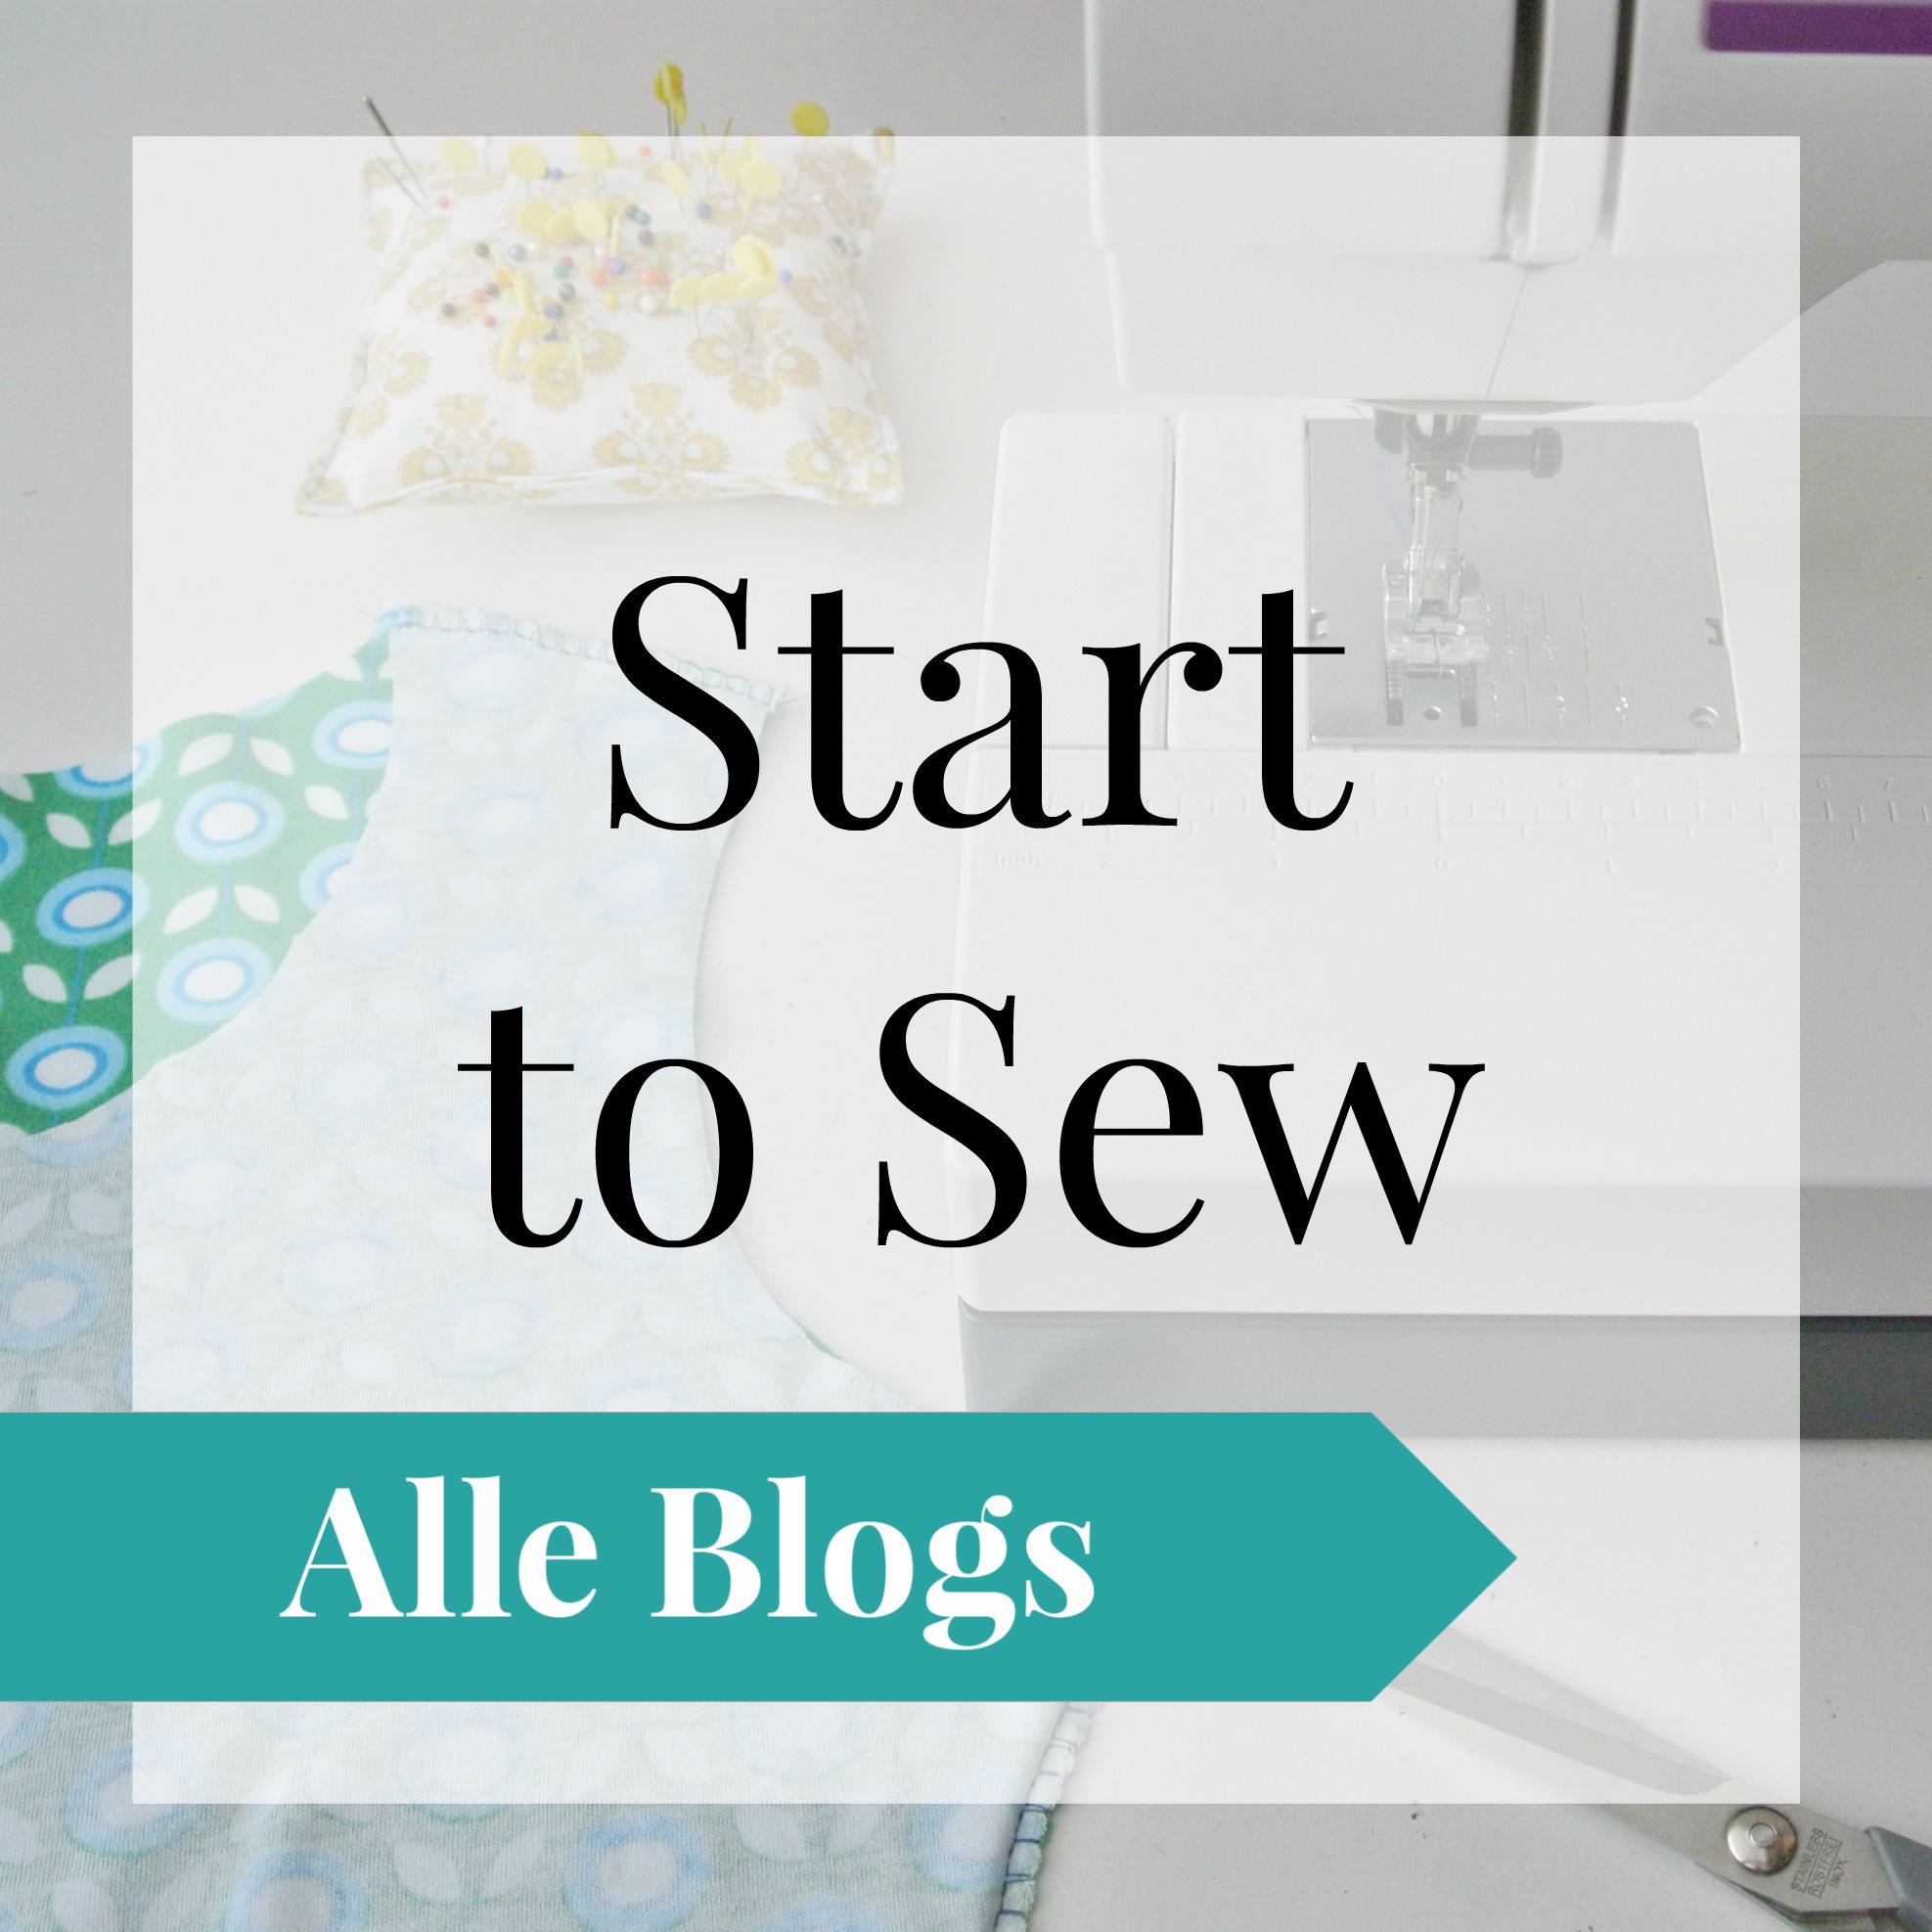 Start to sew Alle Blogs